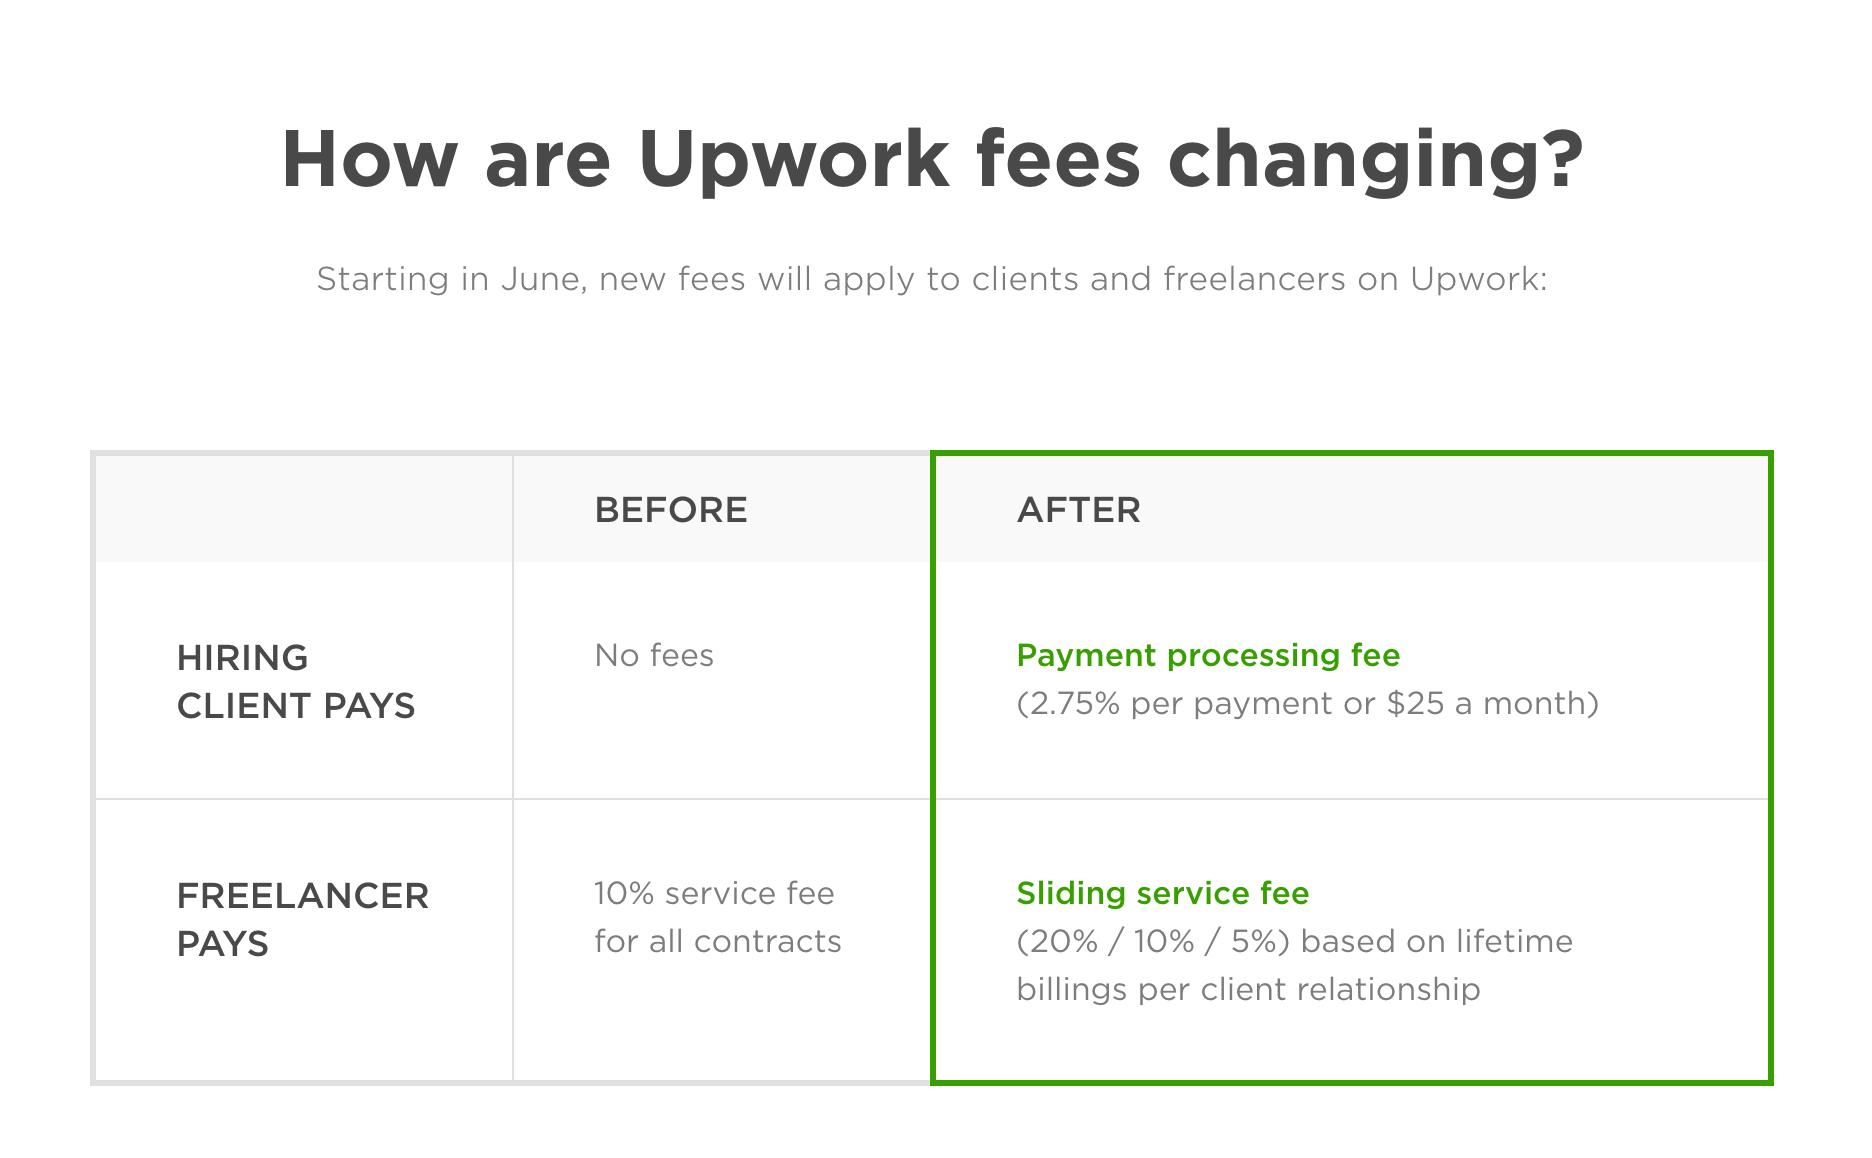 New UpWork fees effective June 2016